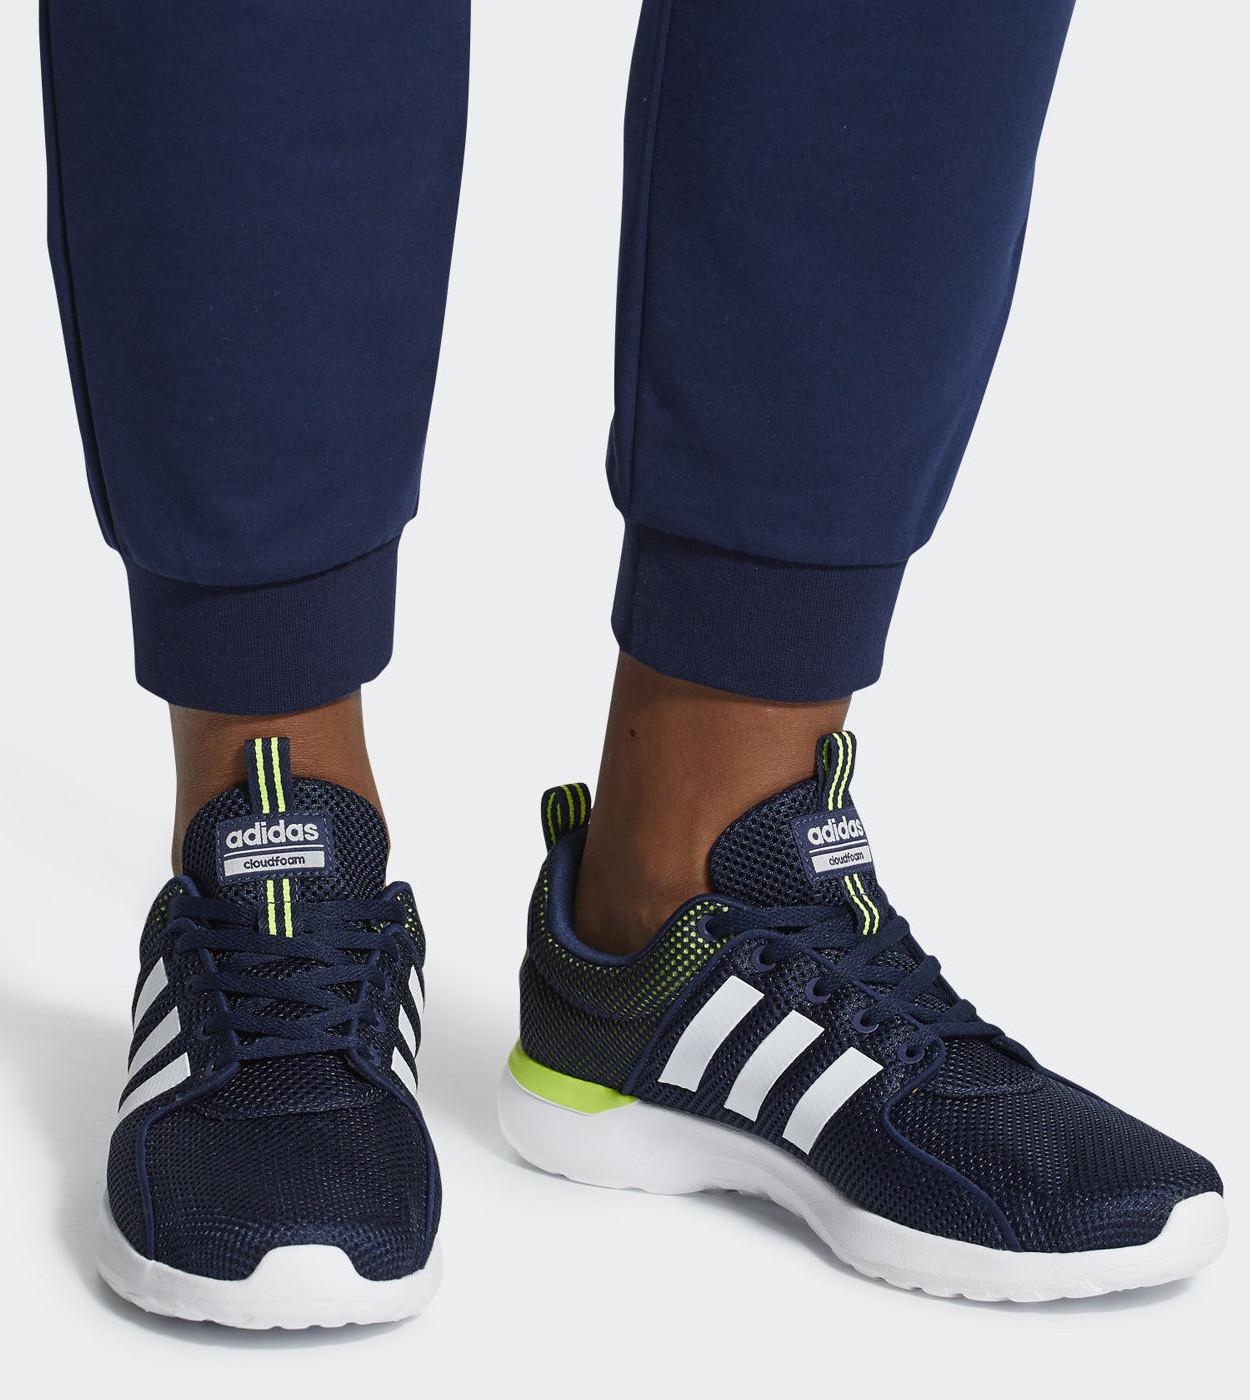 Adidas orginal SUPERSTAR homme  chaussures  trainer fonctionnement   noir  sneakers S75963